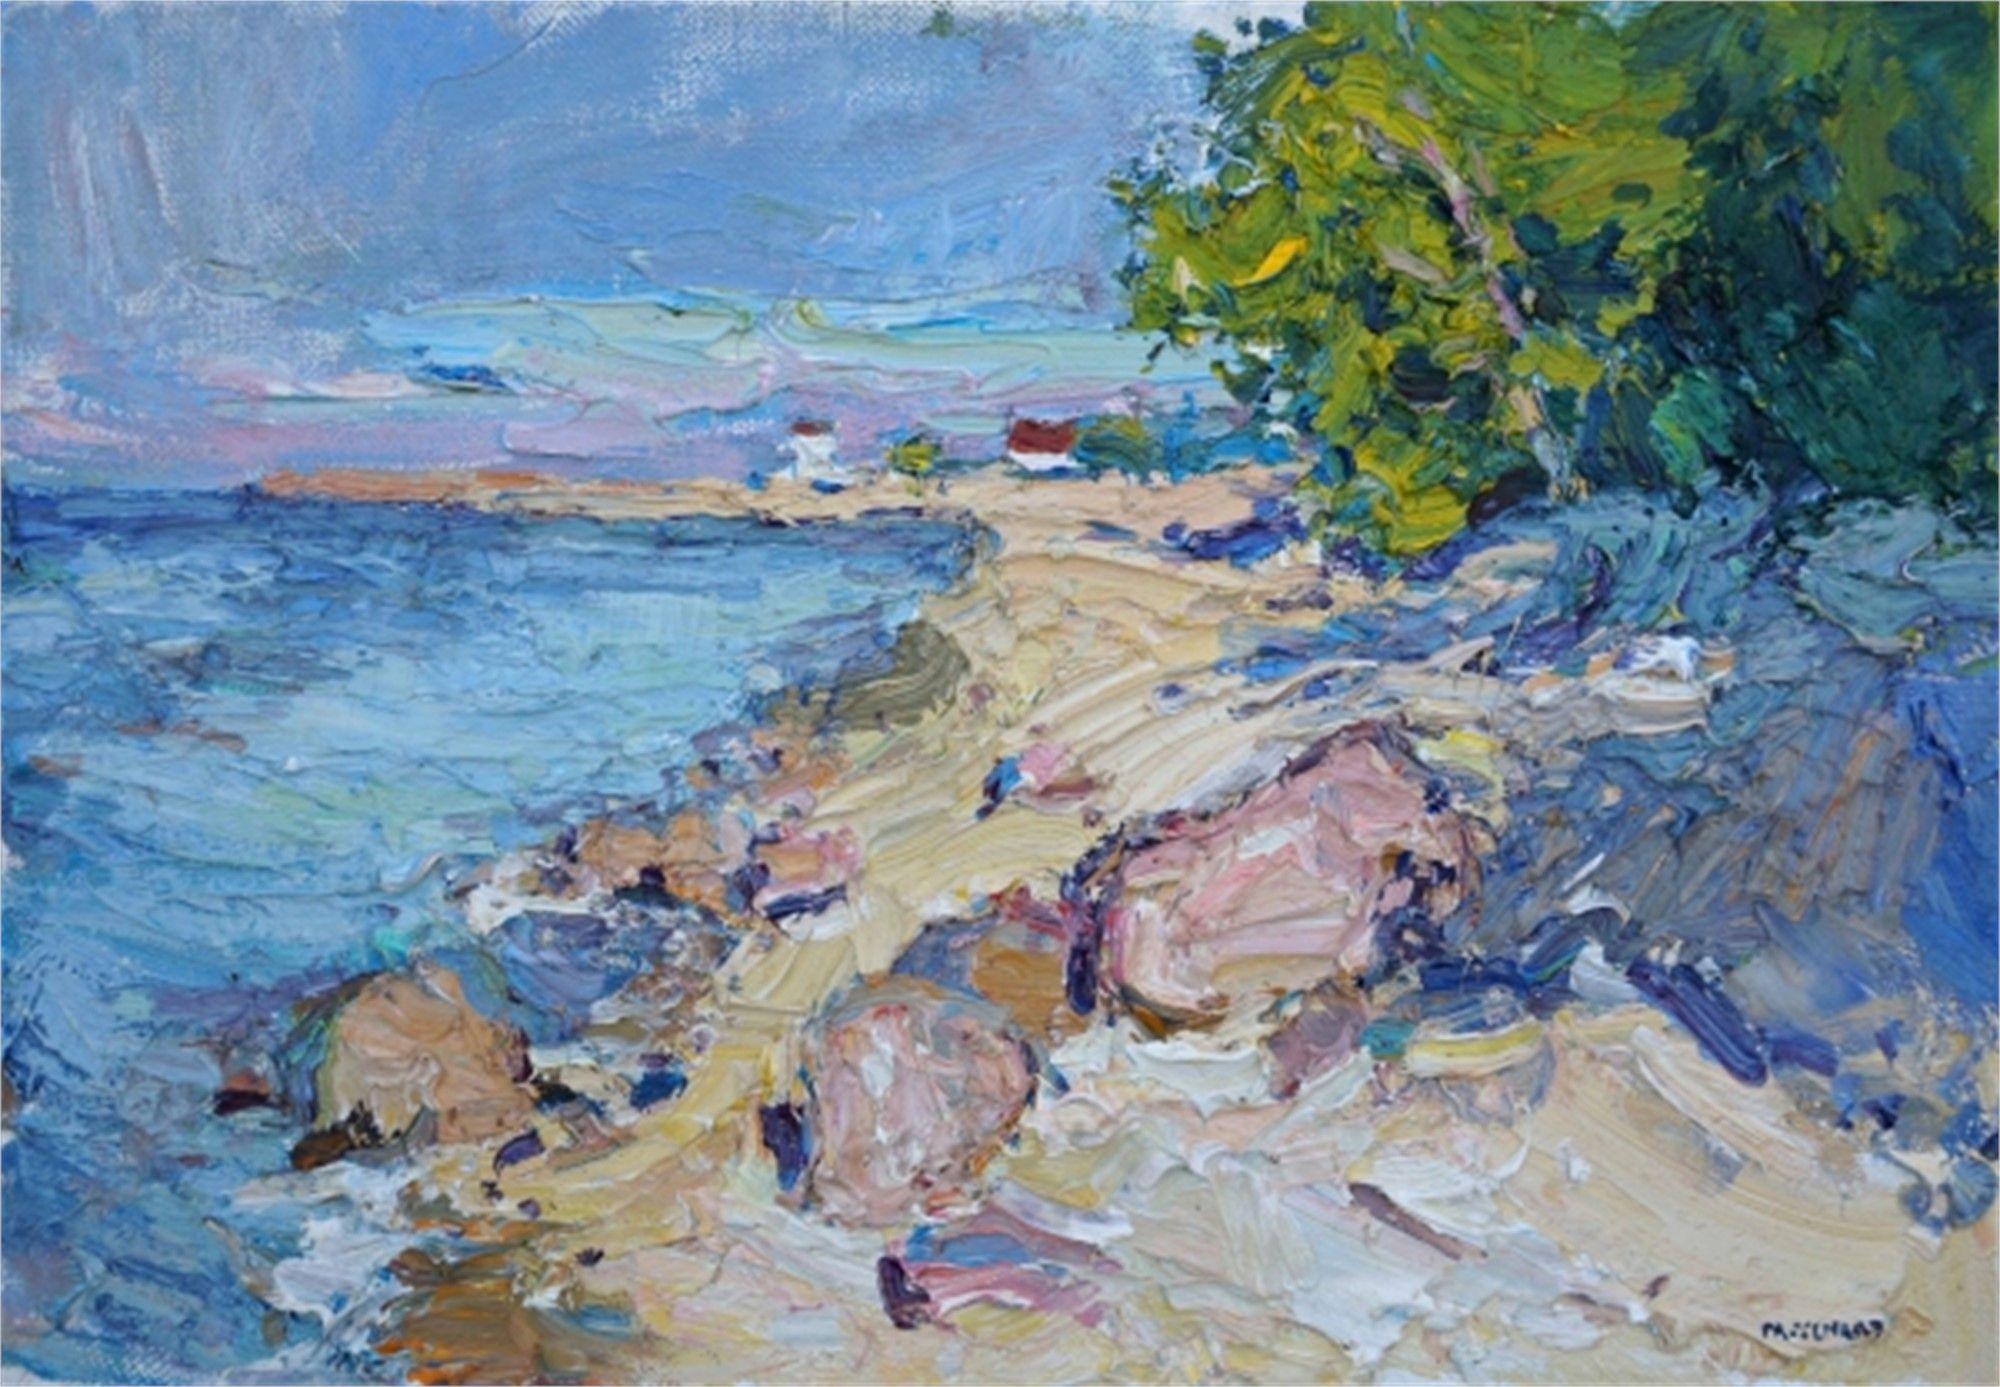 Evening In Toila Original Oil By Antonin Passemard Painting Art Fine Art